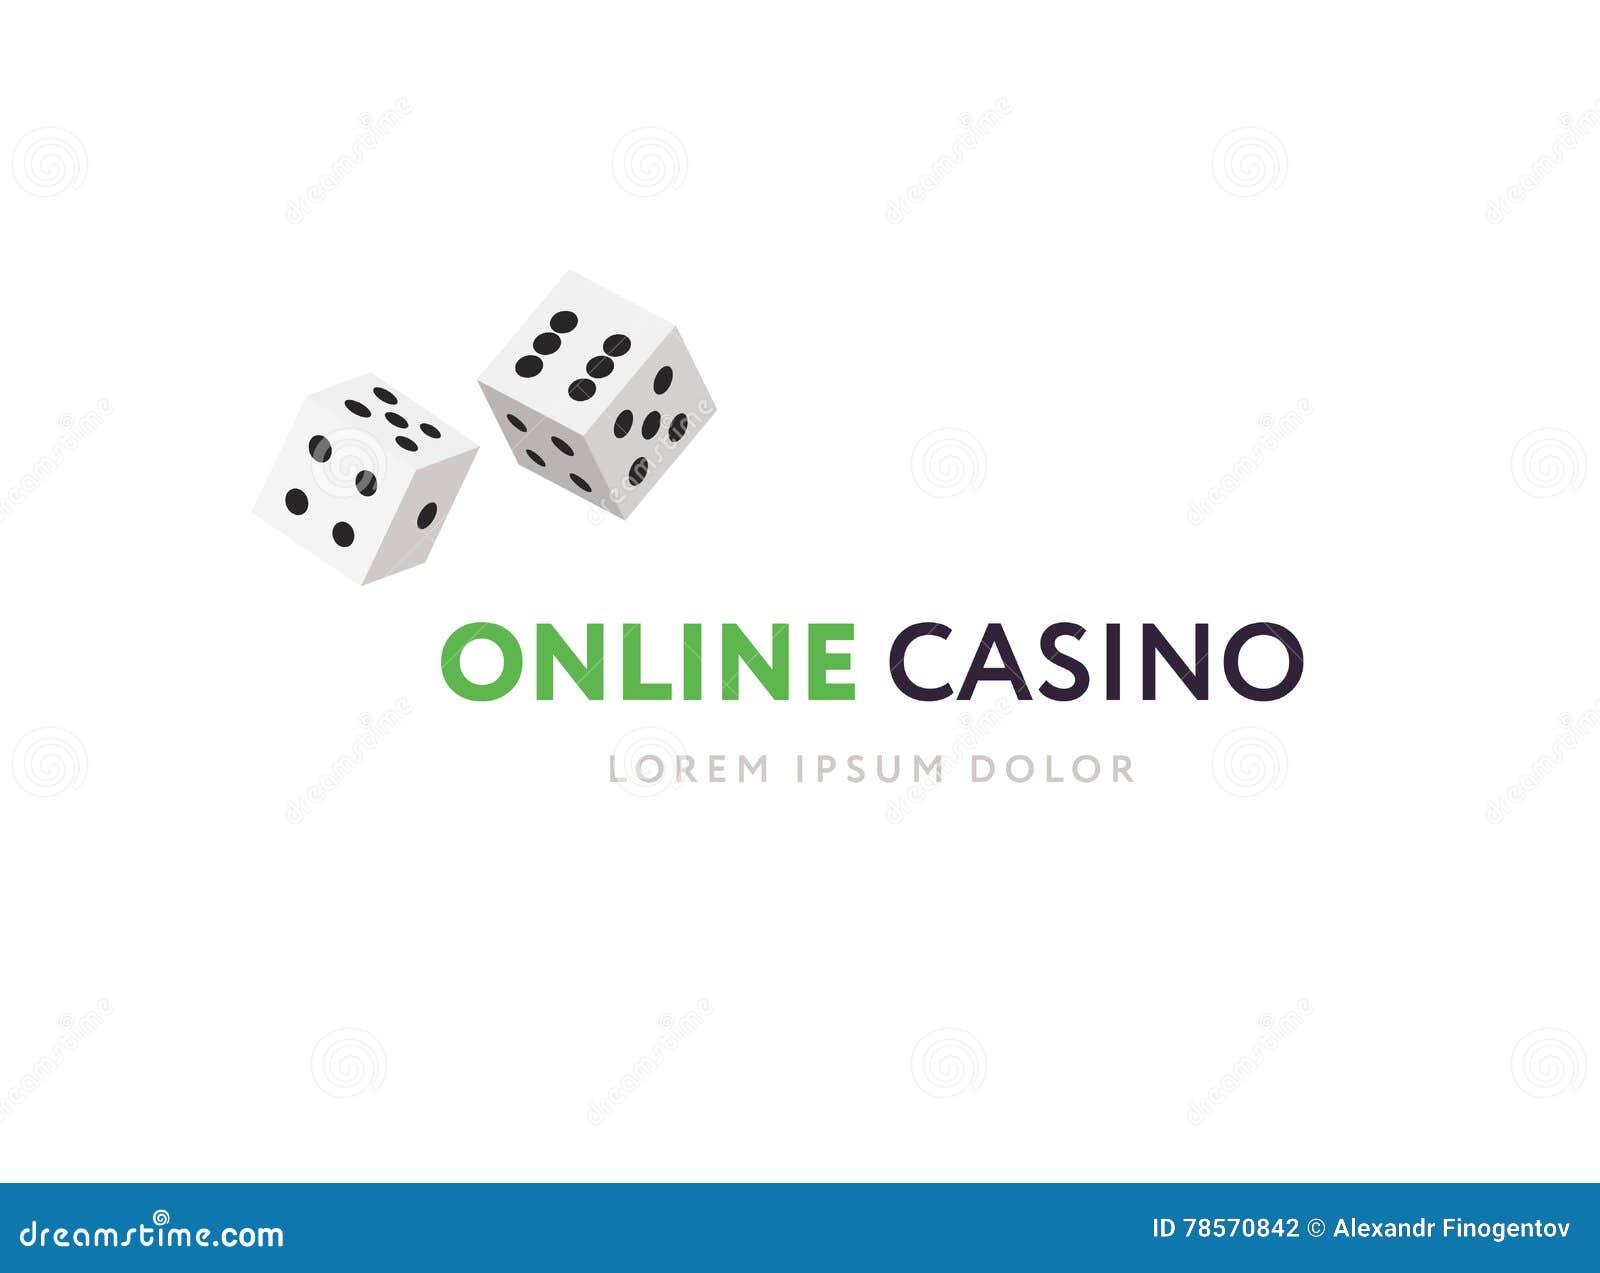 Club online casino las vegas gambling advisor